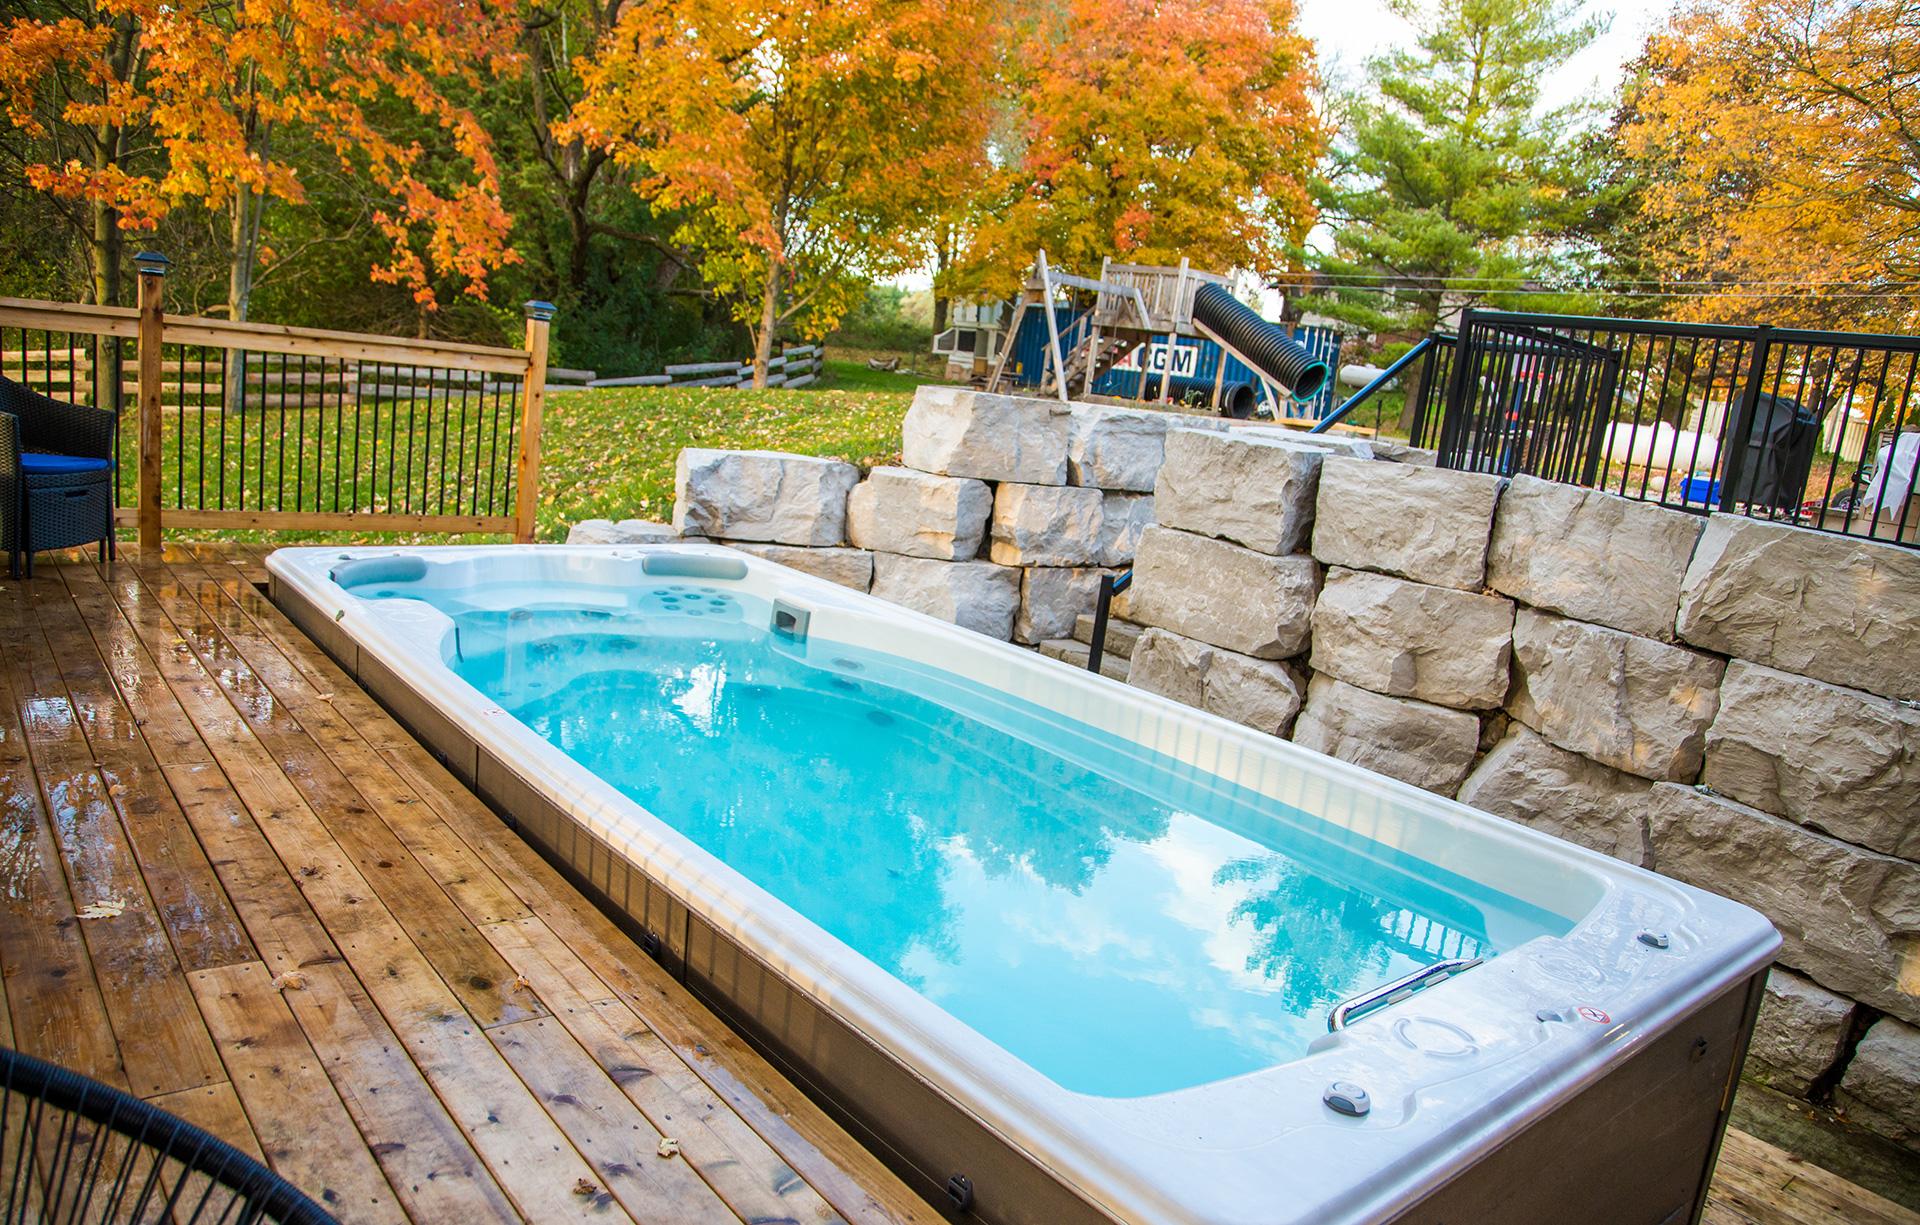 Swimlife swimspa deck installation in fall